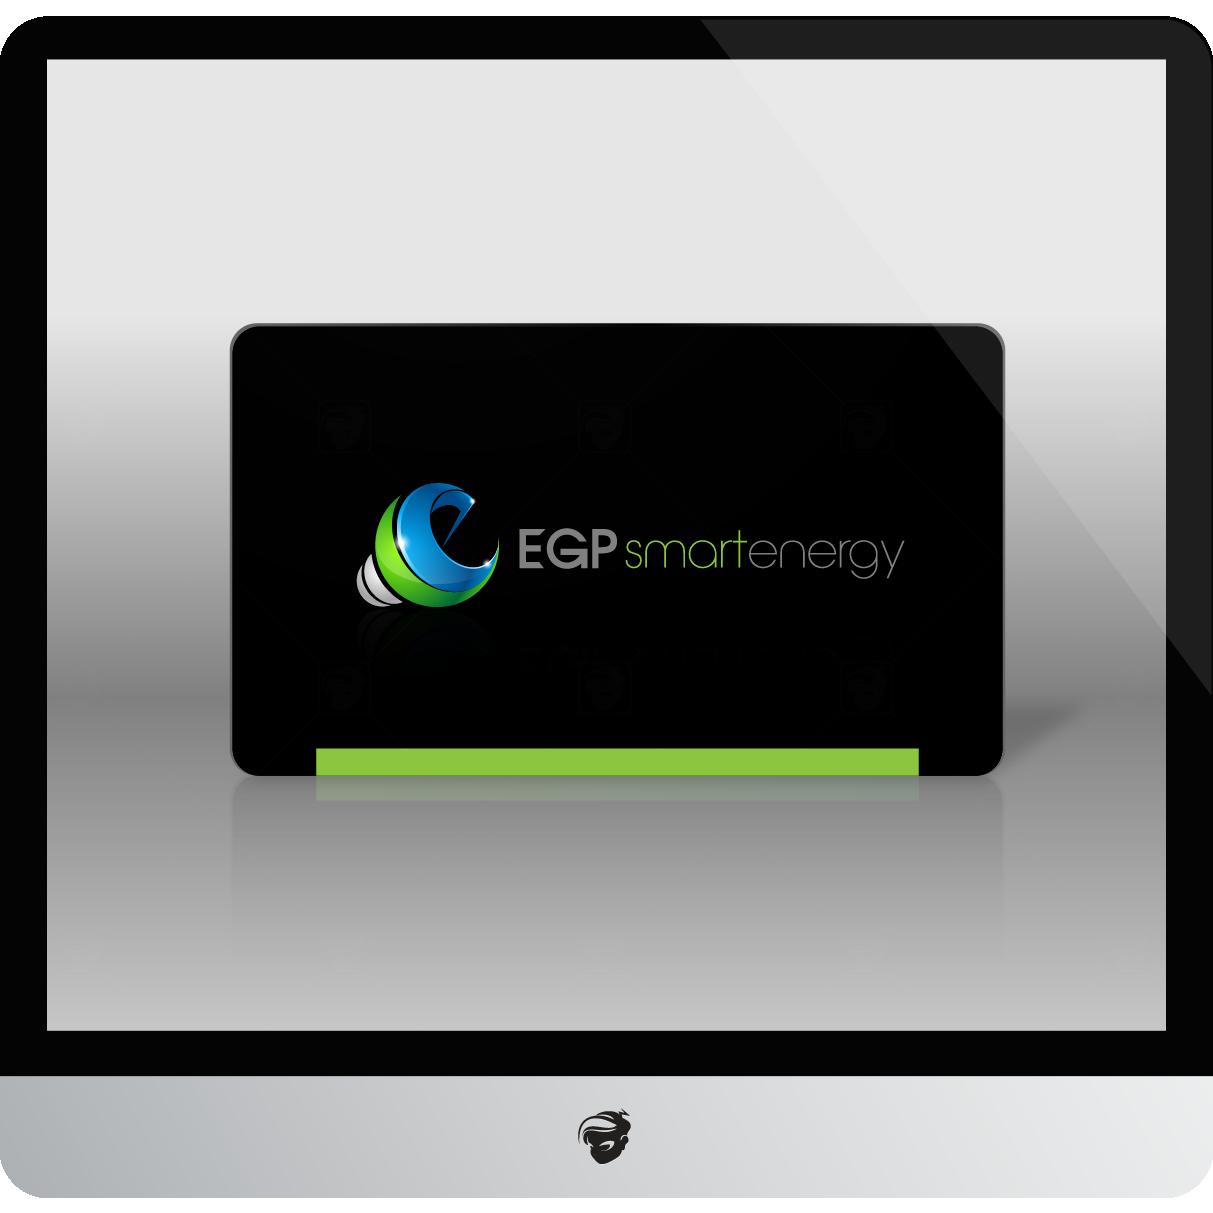 Logo Design by zesthar - Entry No. 91 in the Logo Design Contest Captivating Logo Design for EGP Smart Energy.